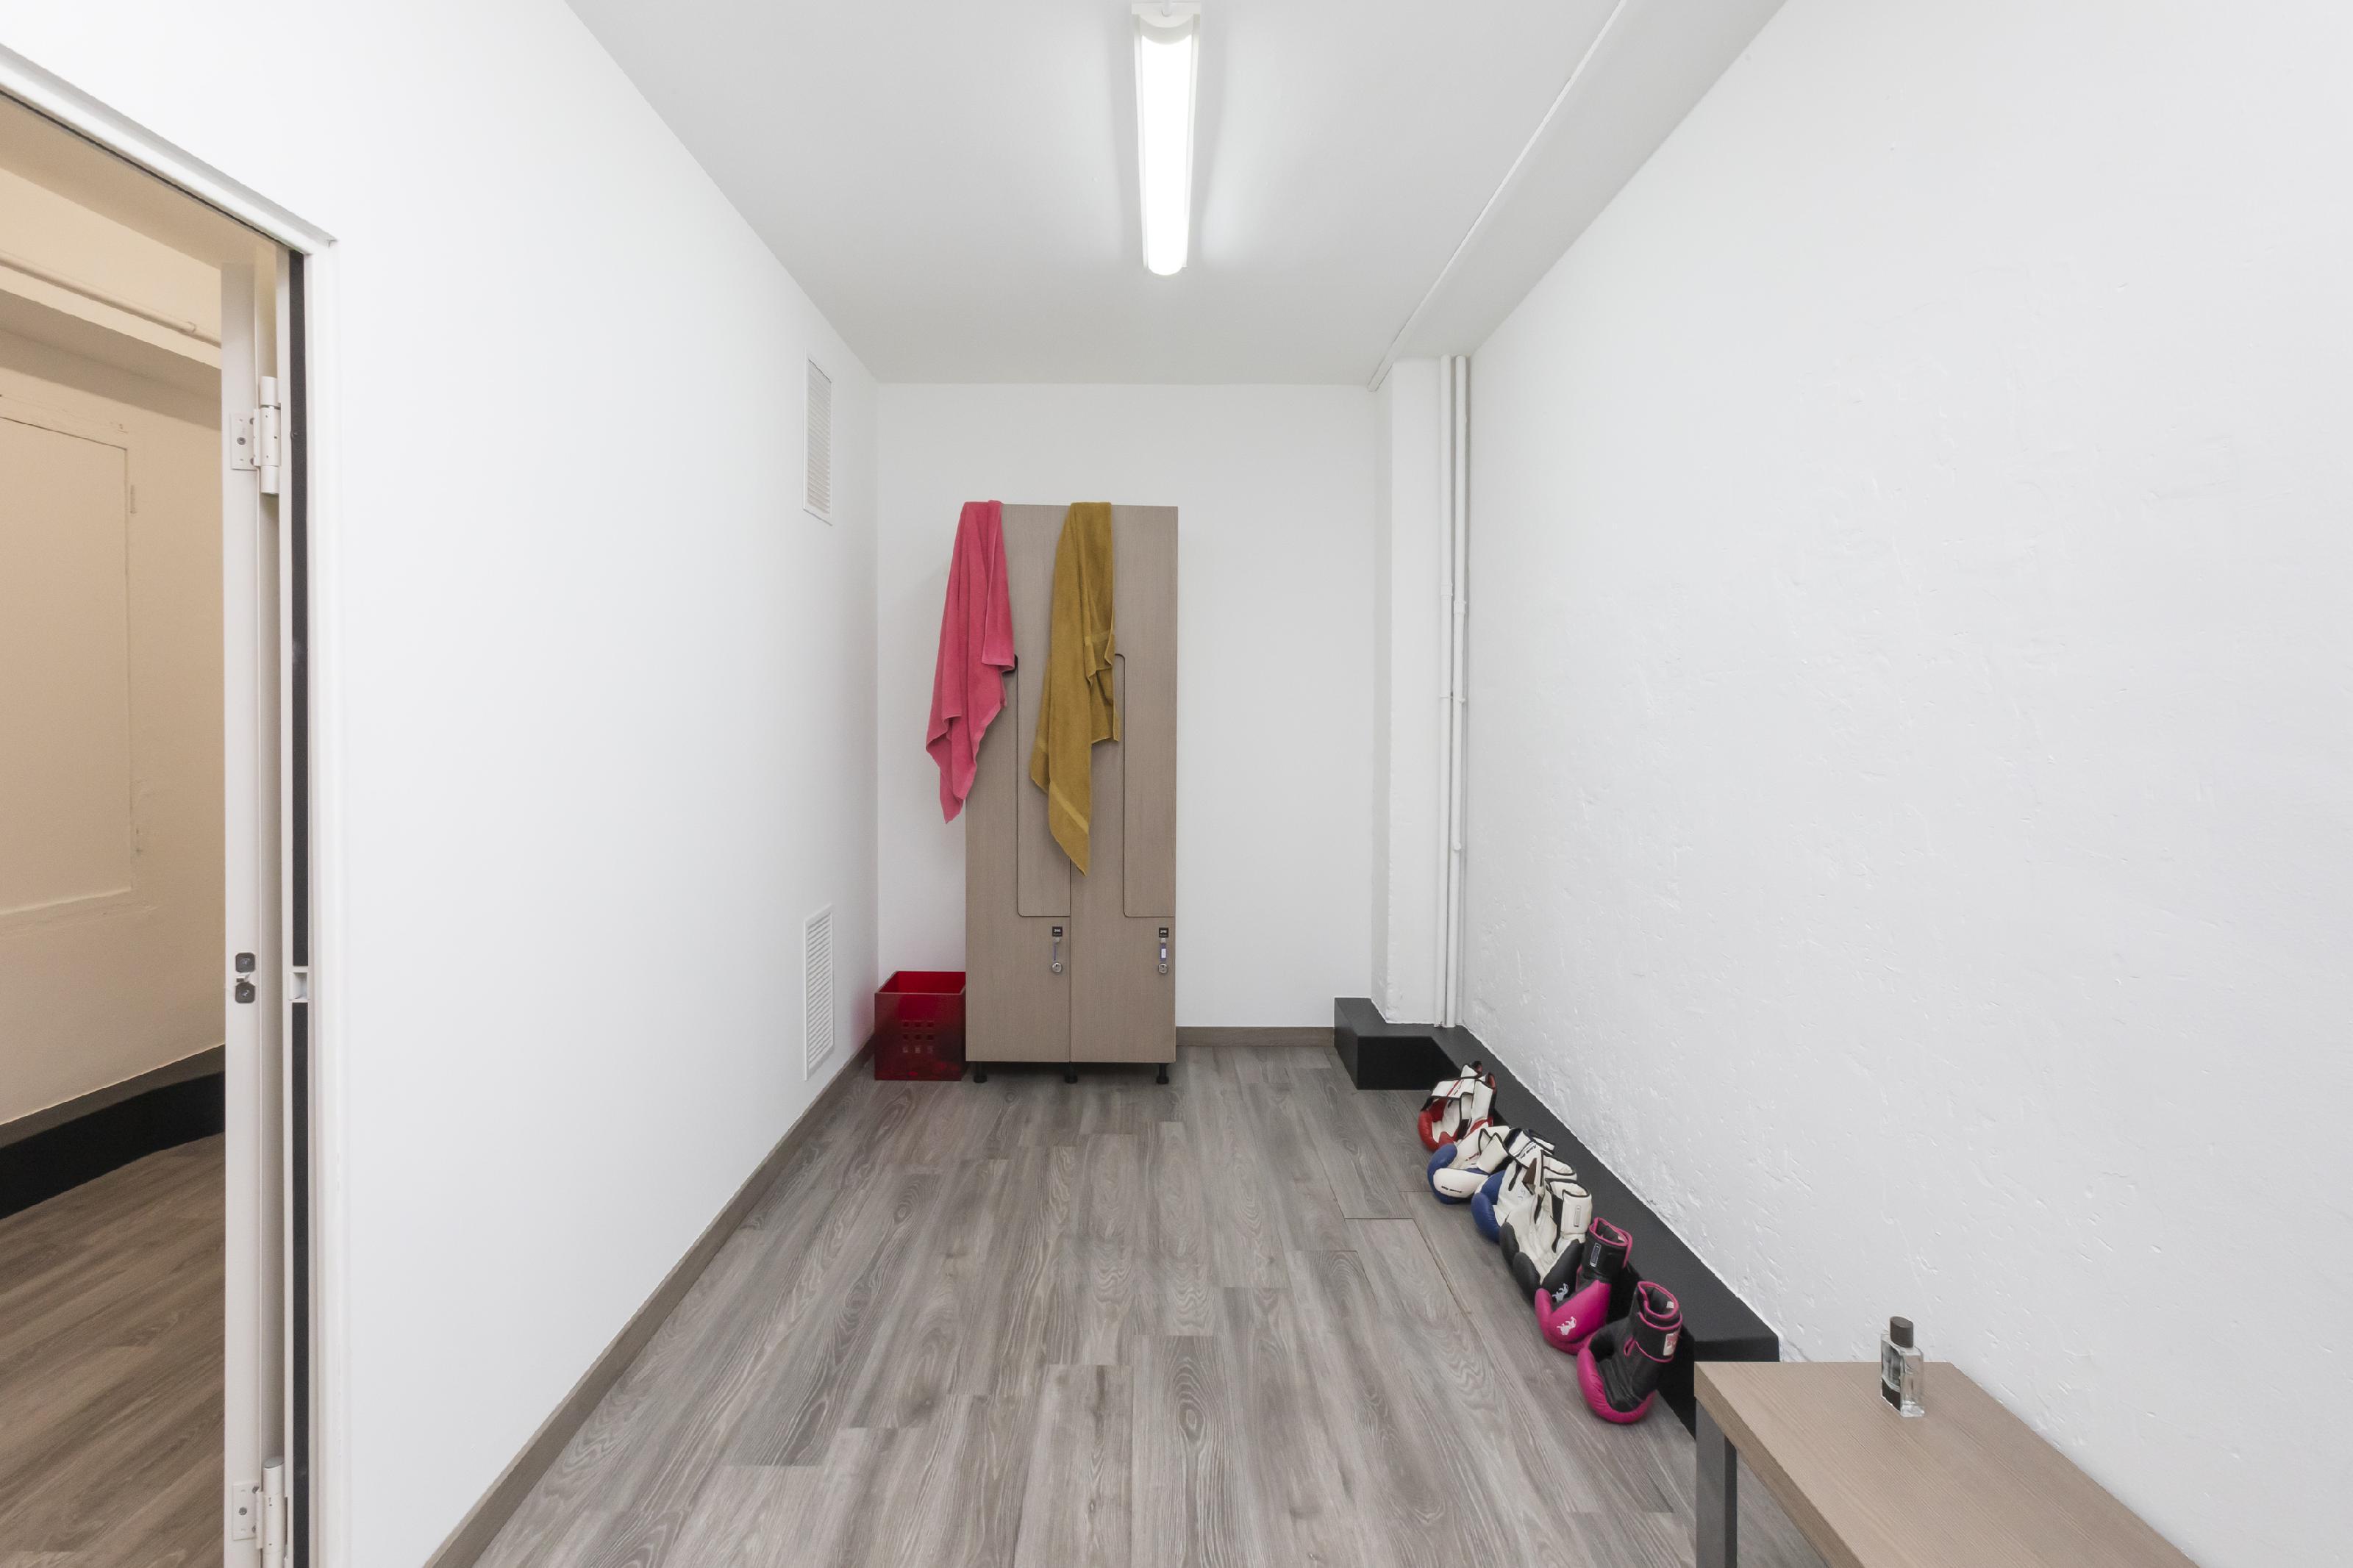 249493 Commercial premises for sale in Sarrià-Sant Gervasi, Sant Gervasi-Galvany 16